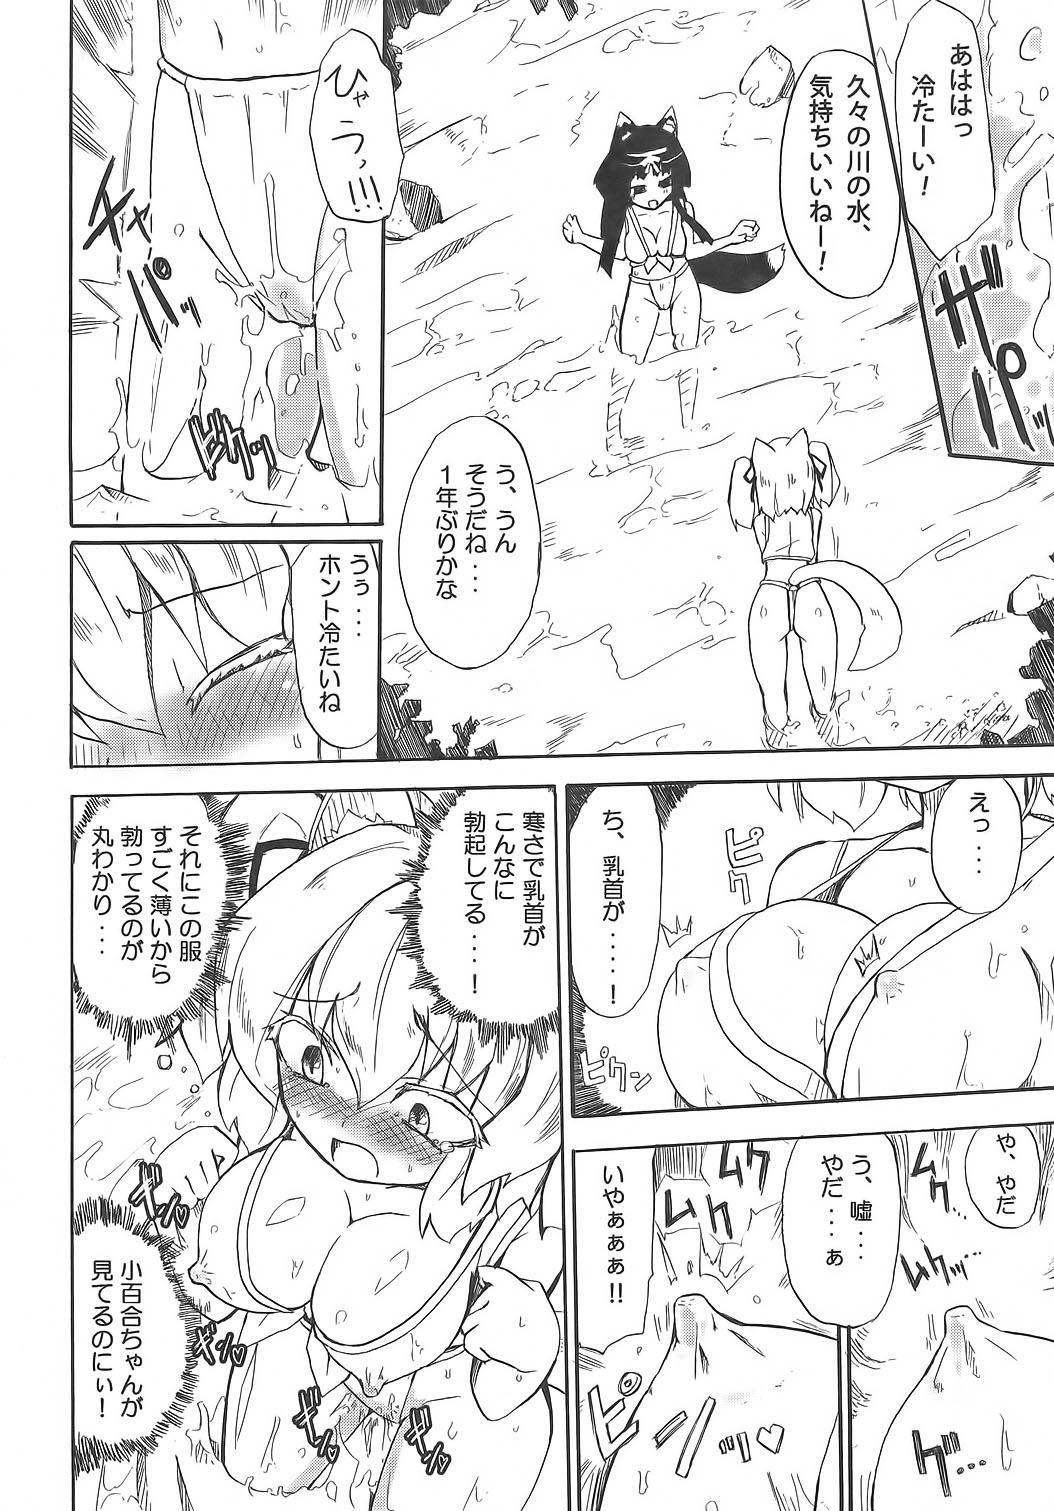 Homuraya Milk ★ Collection 78